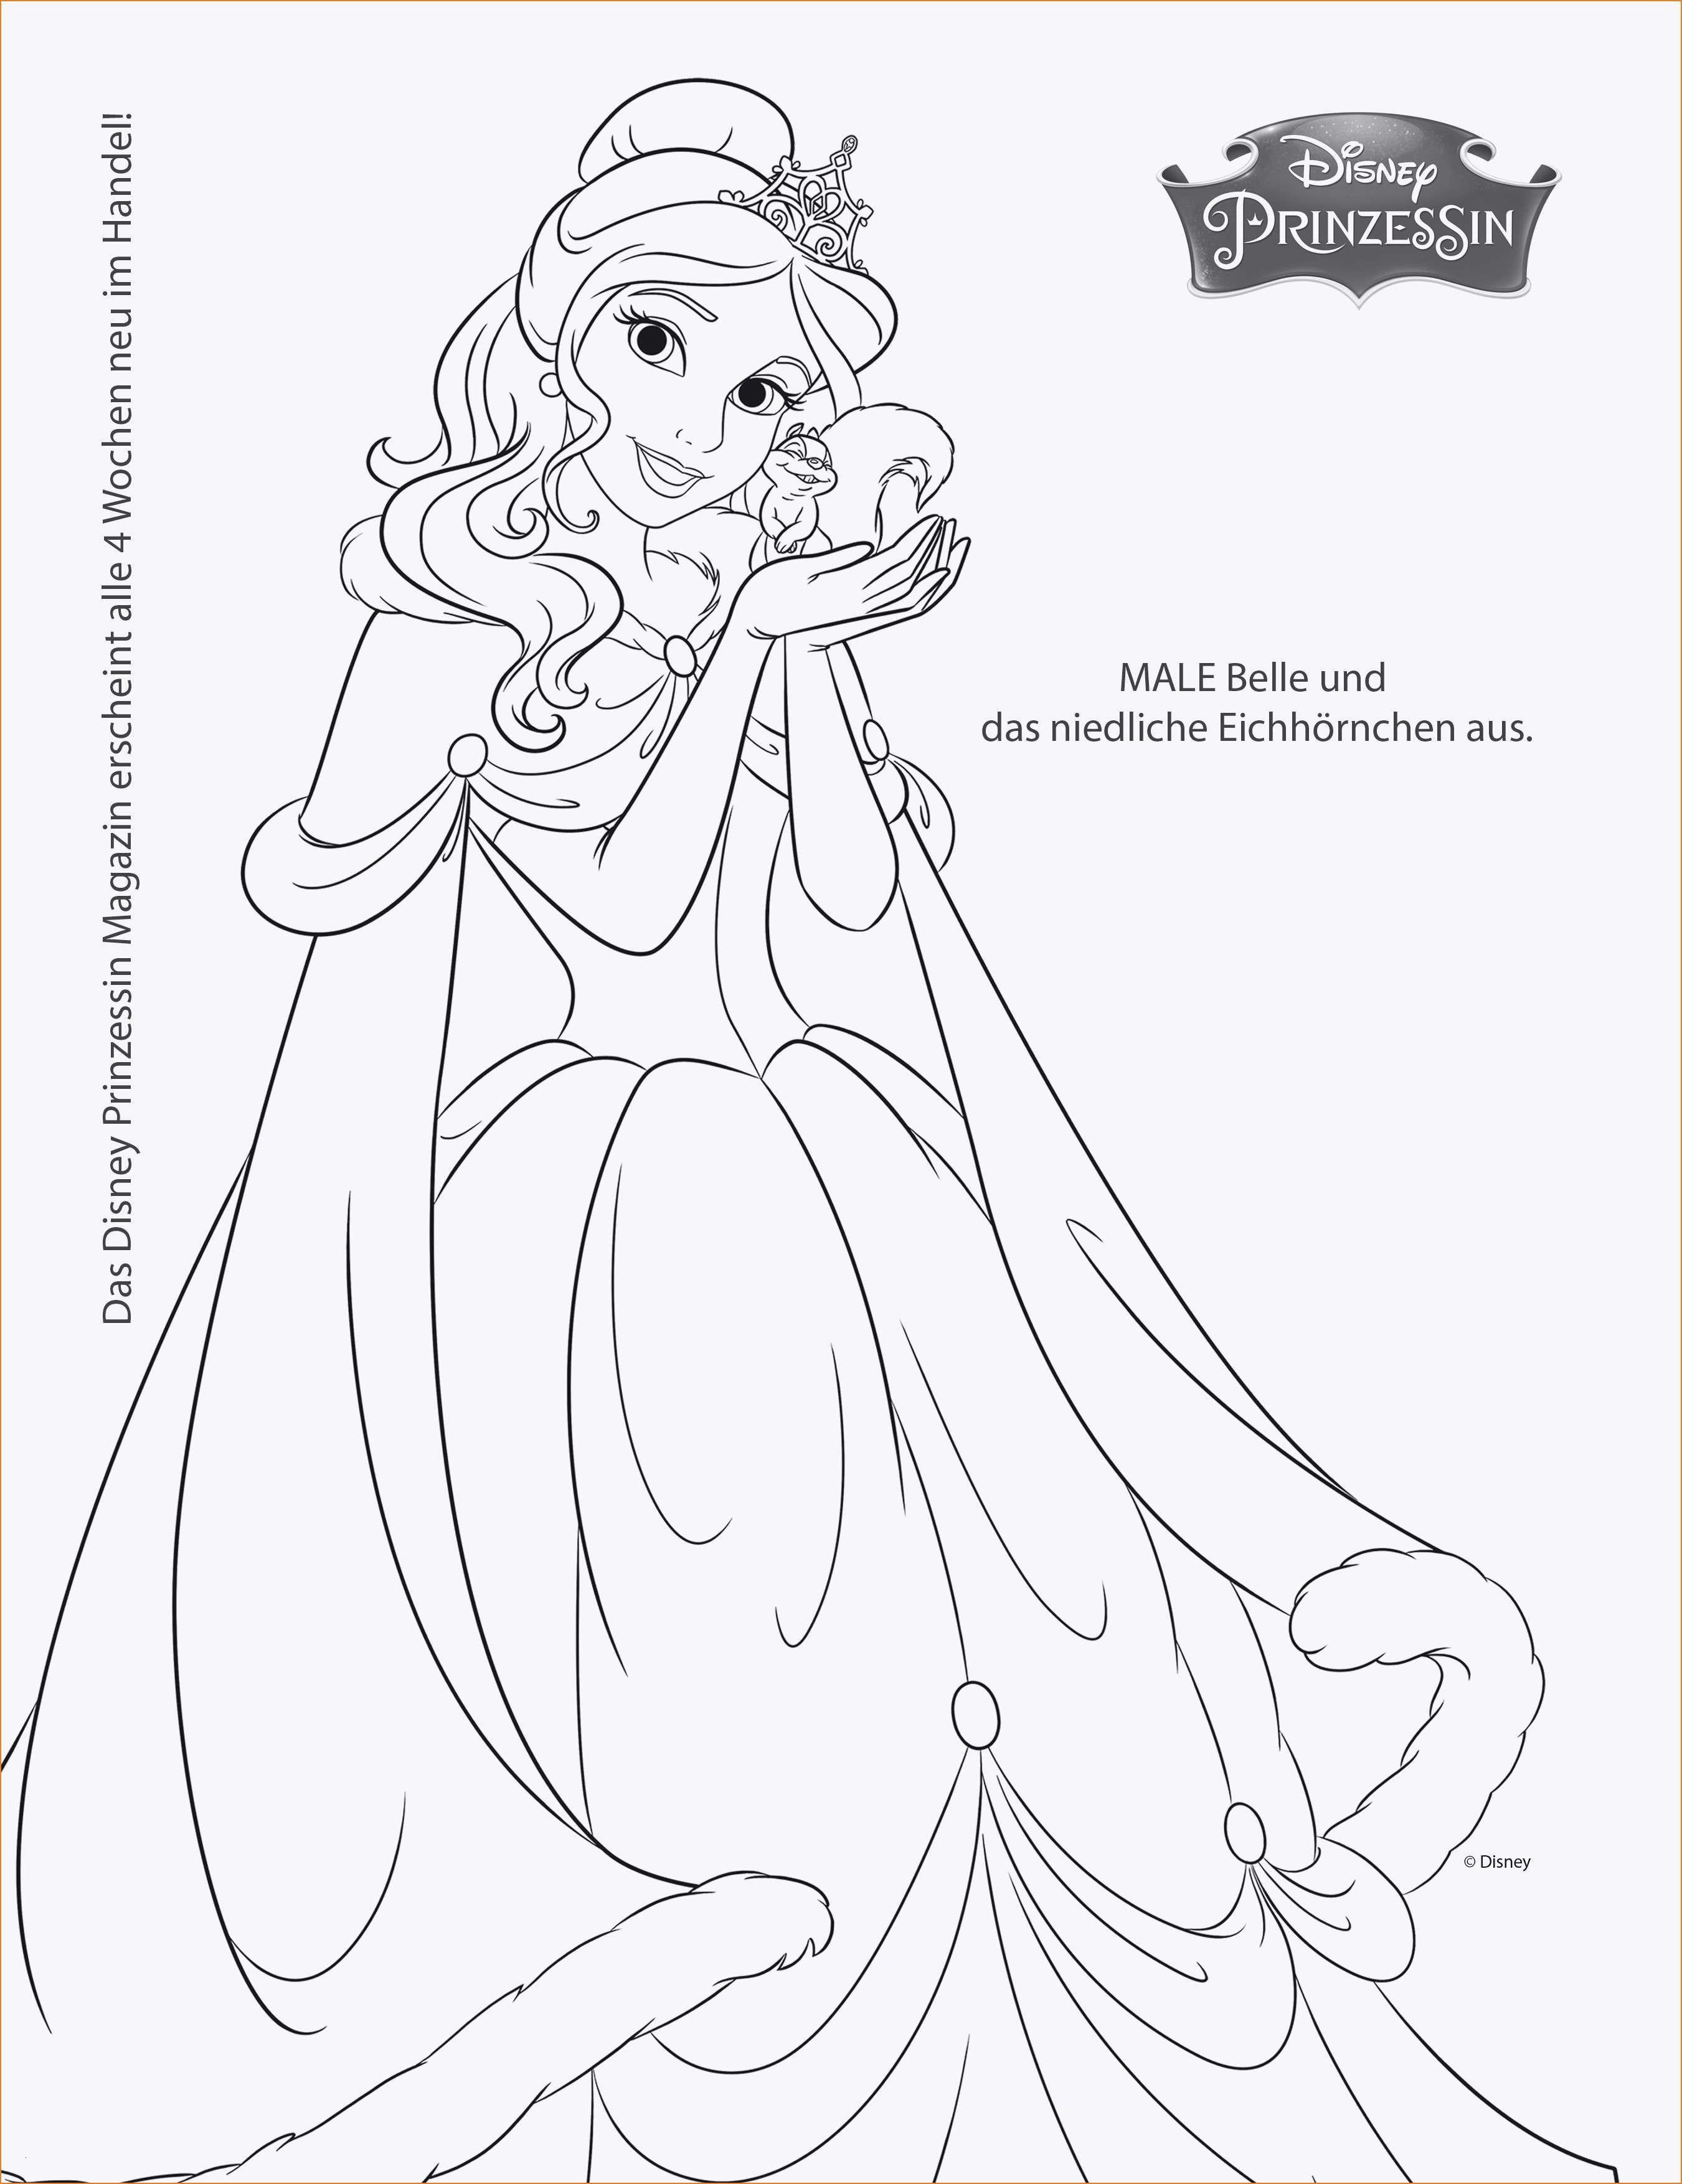 Ausmalbilder Disney Junior Inspirierend 47 Pj Masks Ausmalbilder Galerie